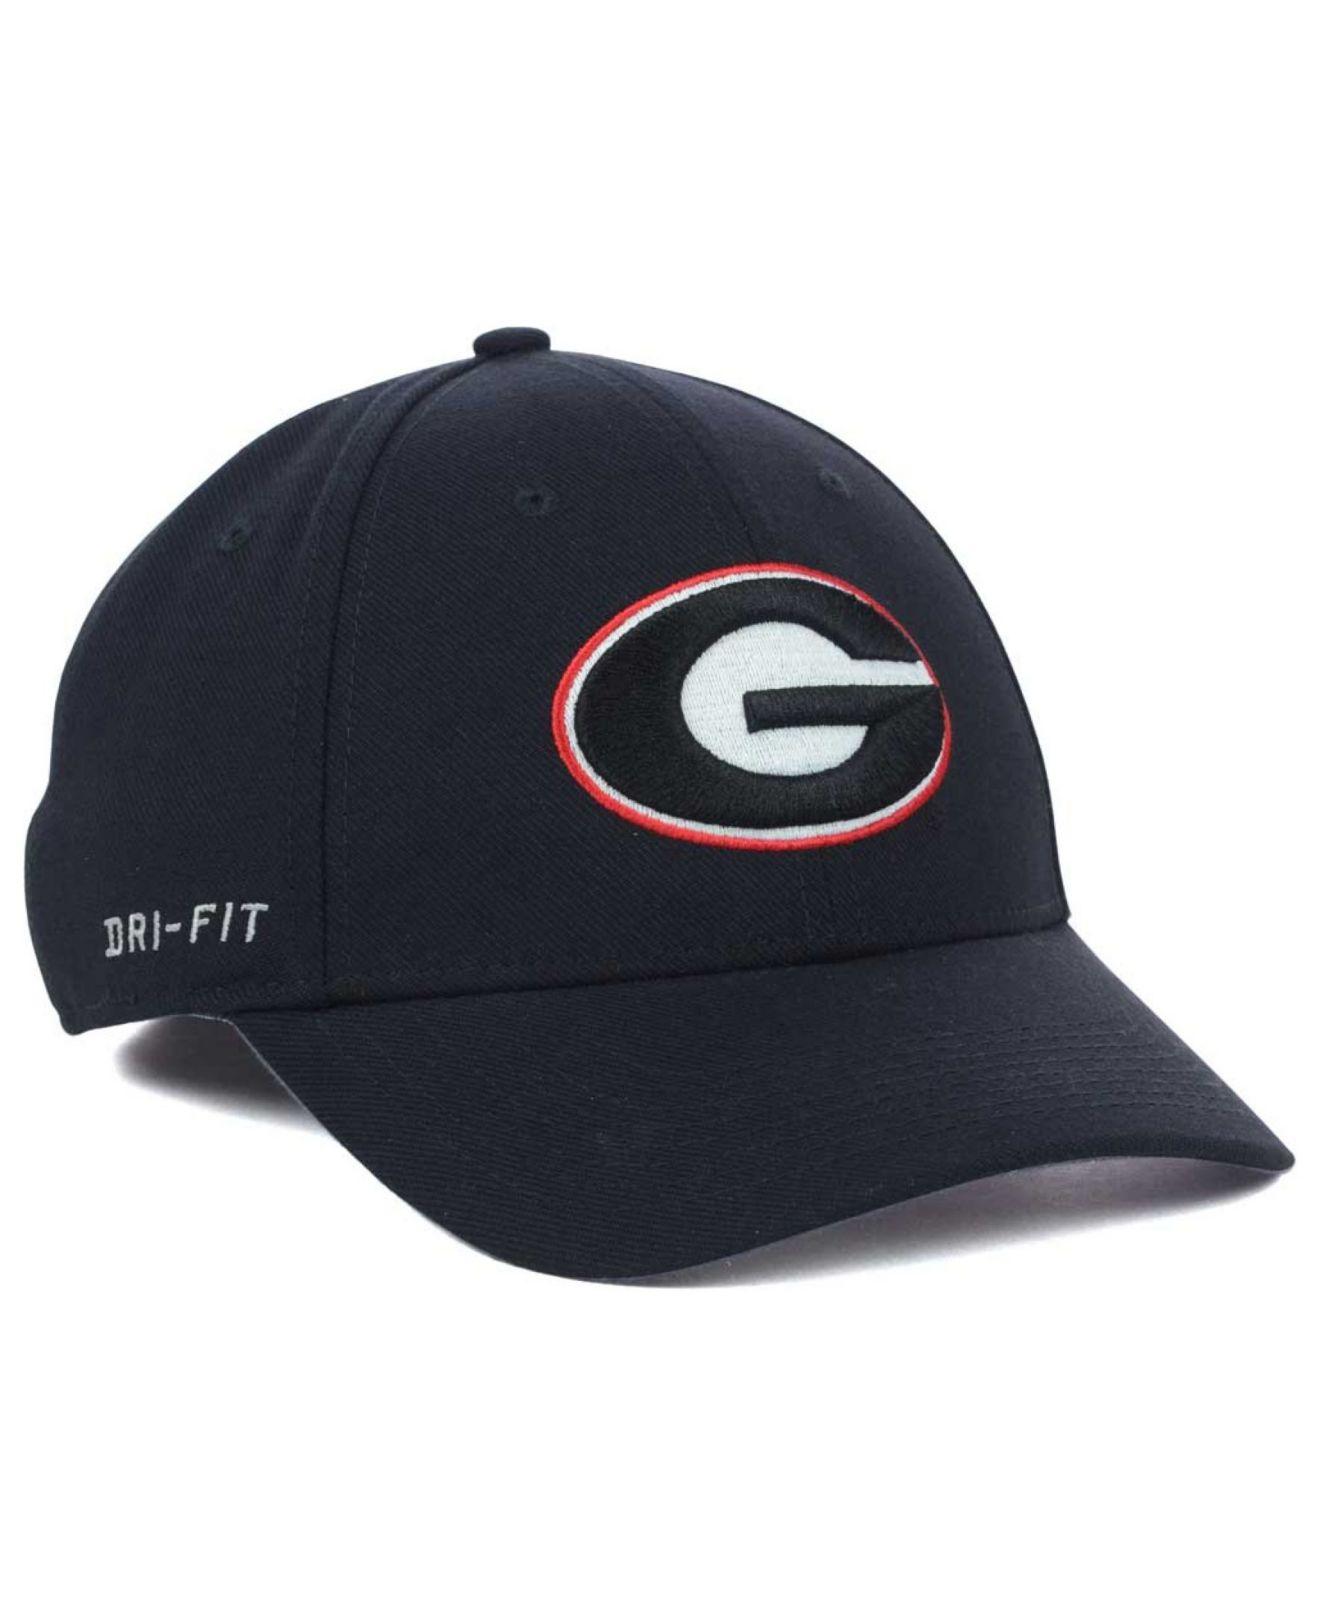 Lyst - Nike Georgia Bulldogs Dri-Fit Swoosh Flex Cap in Black for Men 560a1bcd9ea